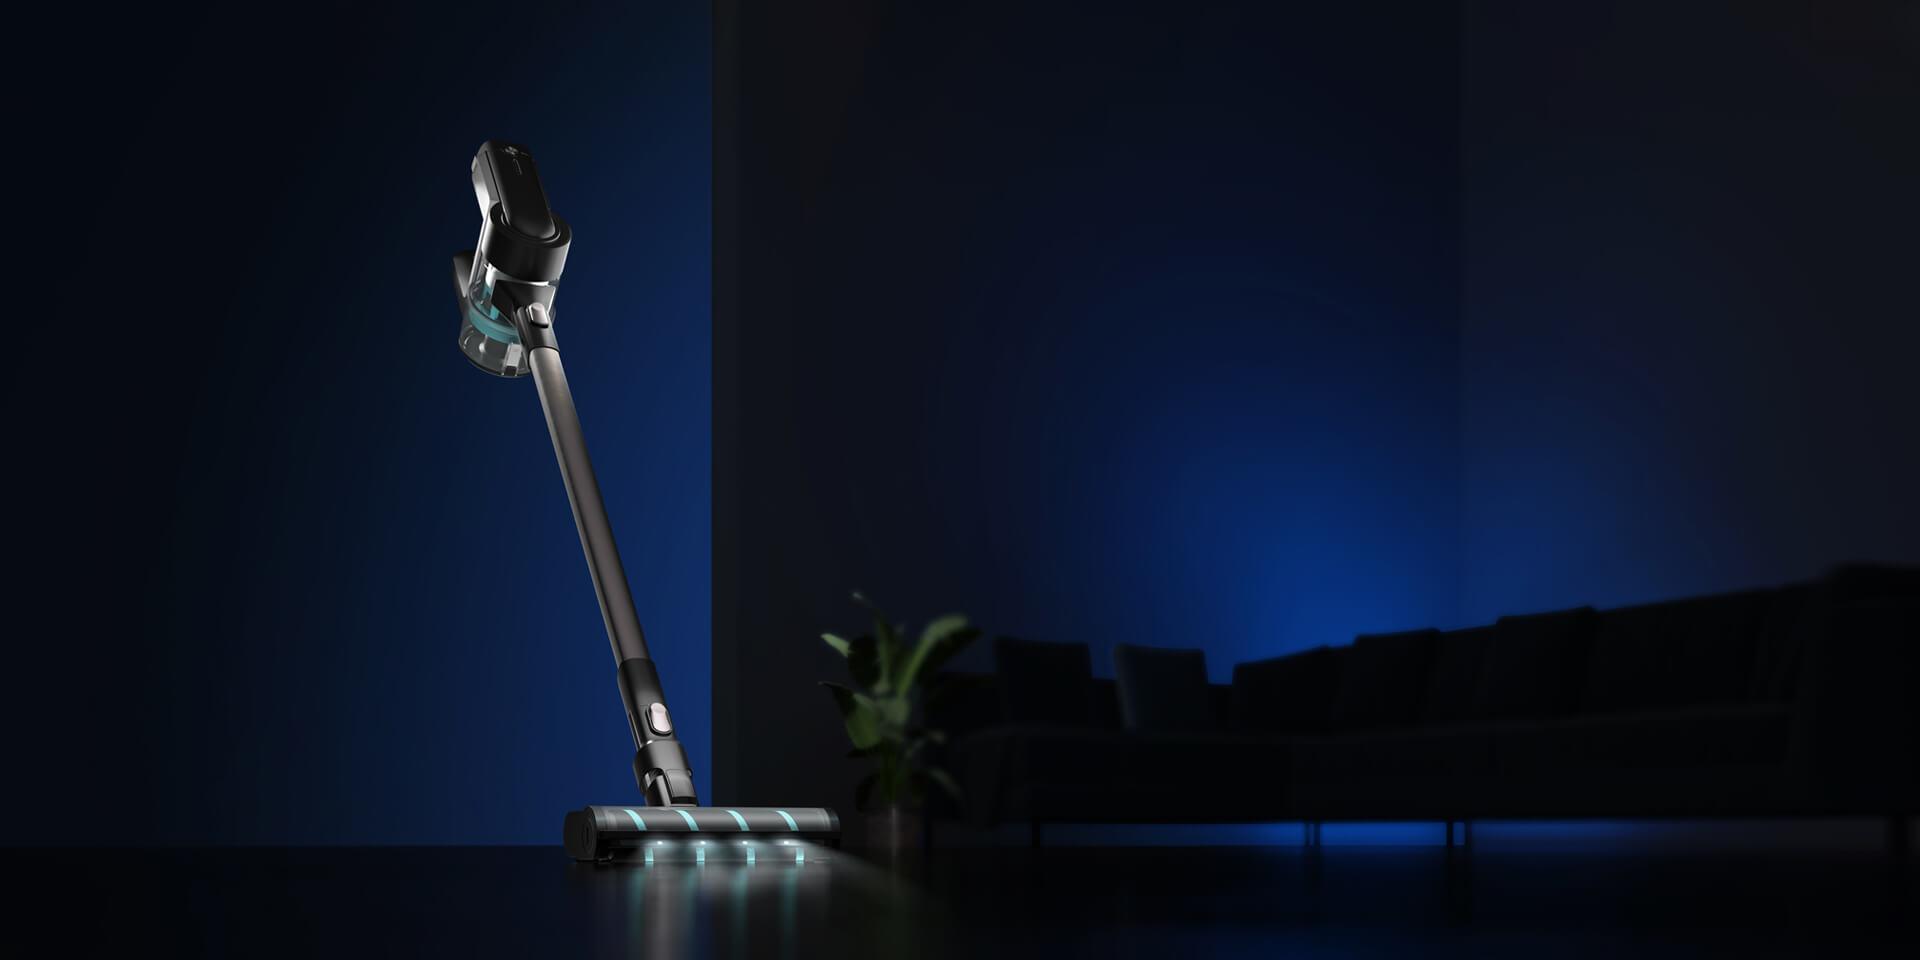 Viomi A9 Cordless Vacuum Cleaner